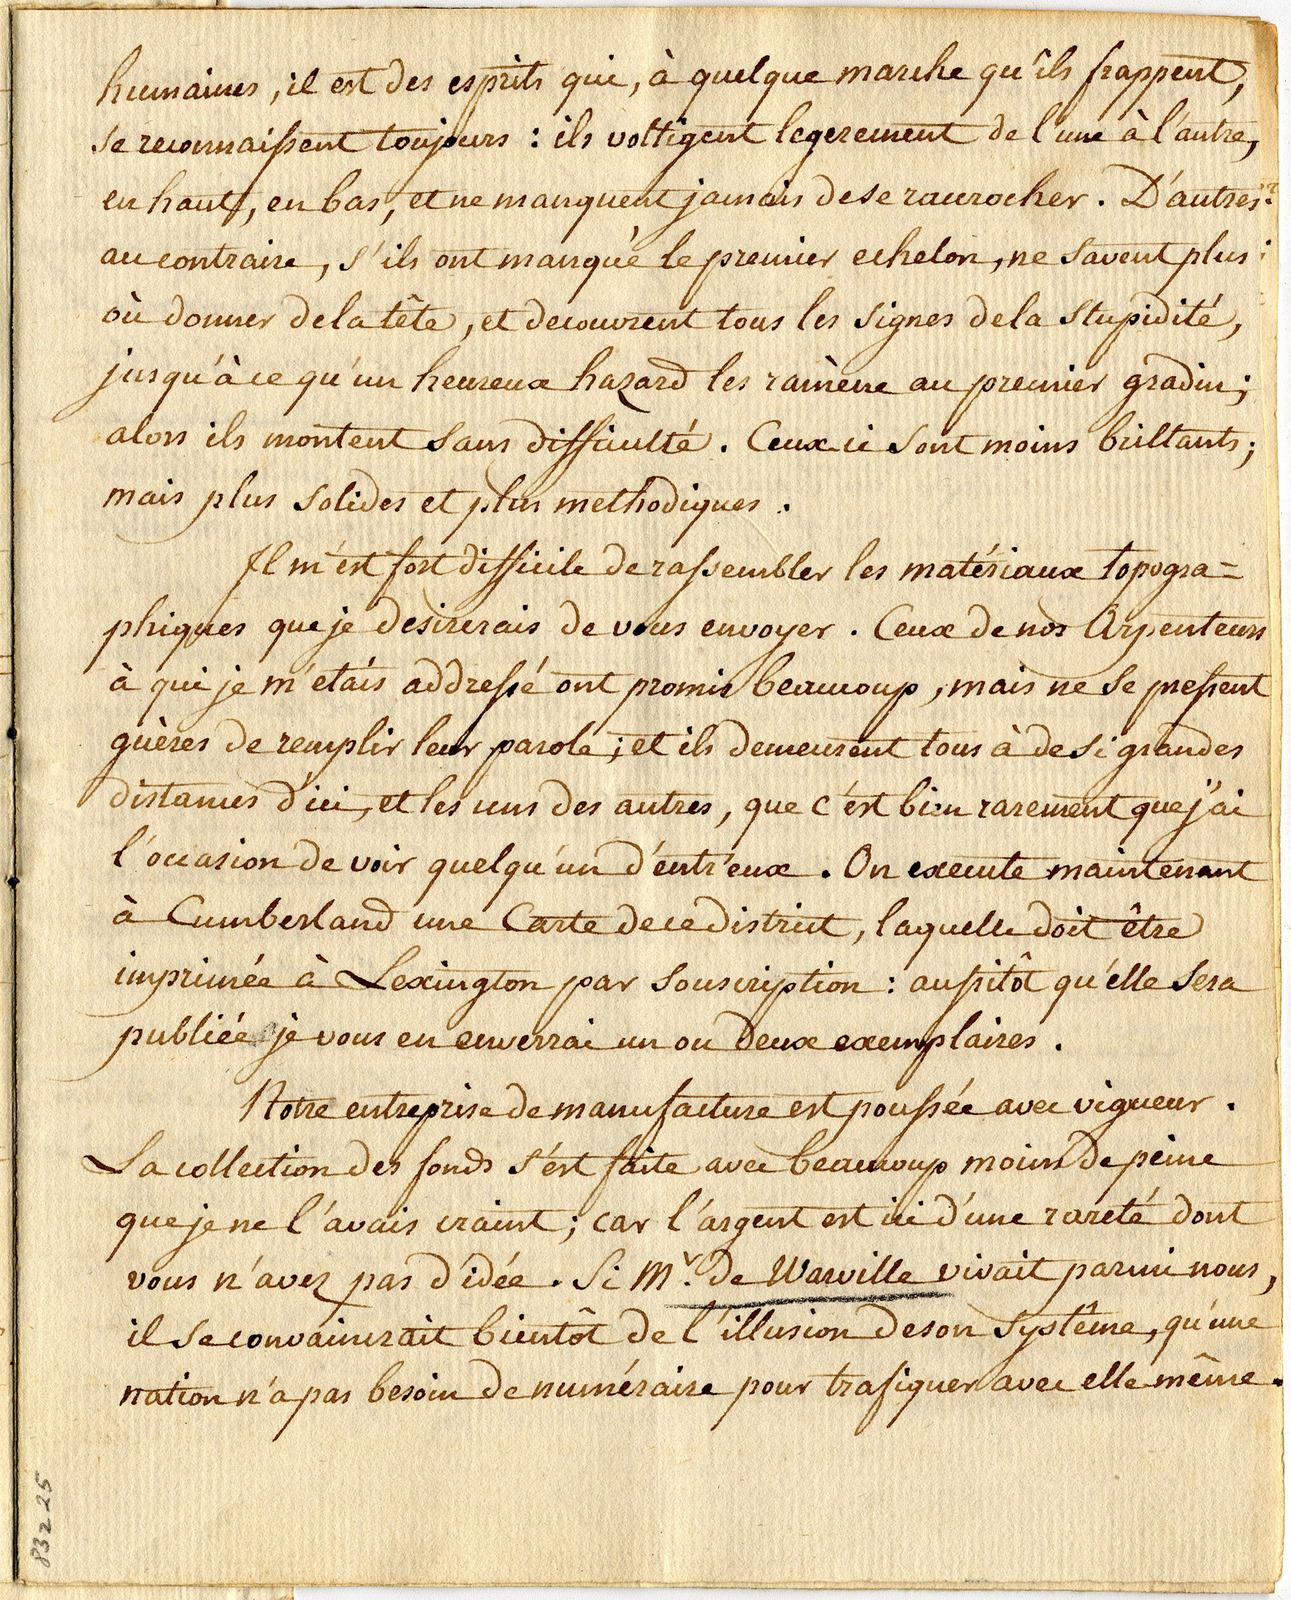 Letter from Barthelemi Tardiveau to St. John de Crevecoeur, 2nd